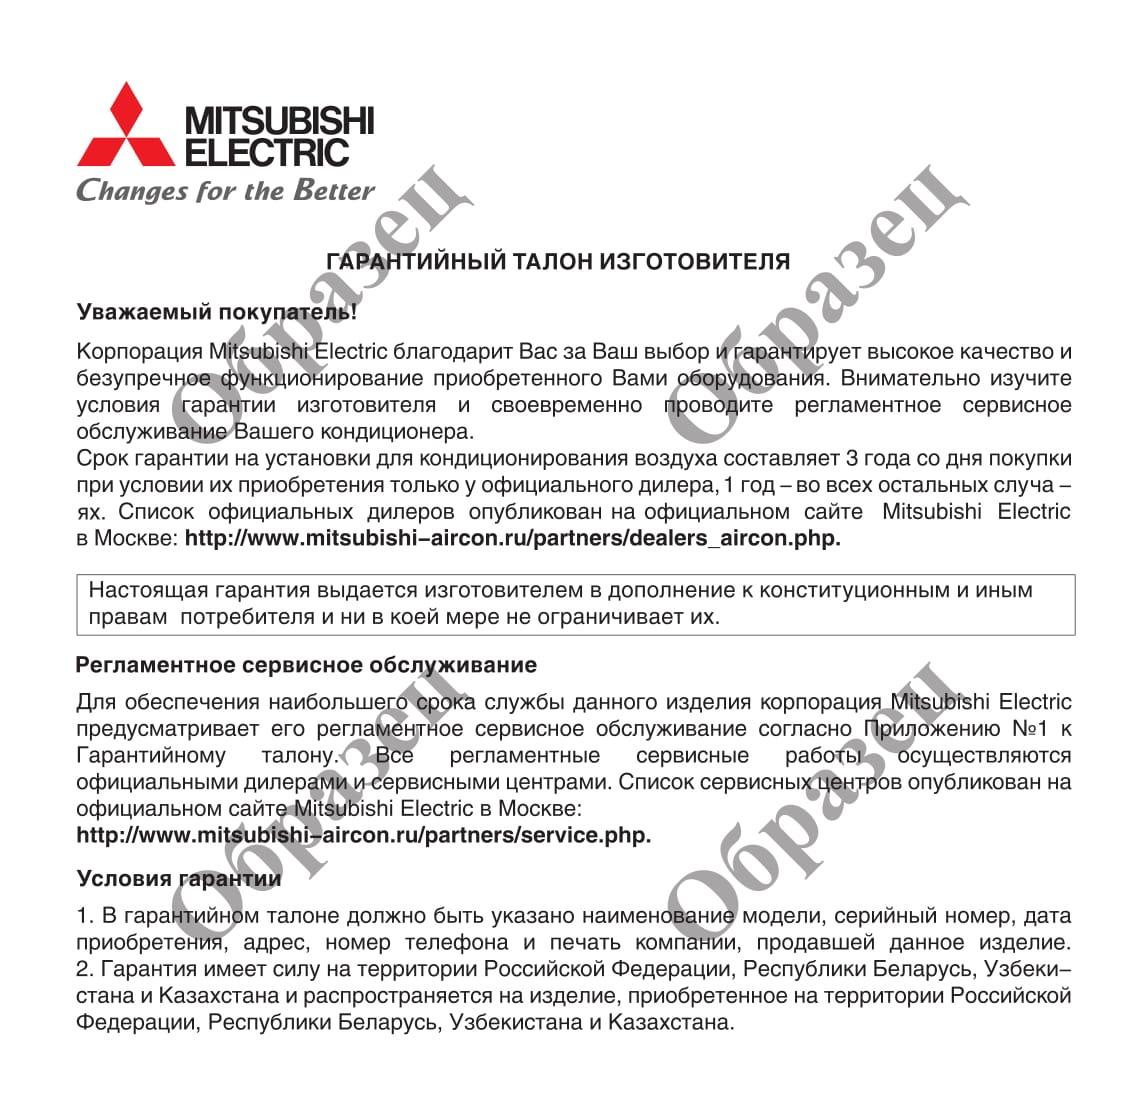 гарантия на обслуживание и ремонт кондиционеров mitsubishi electric